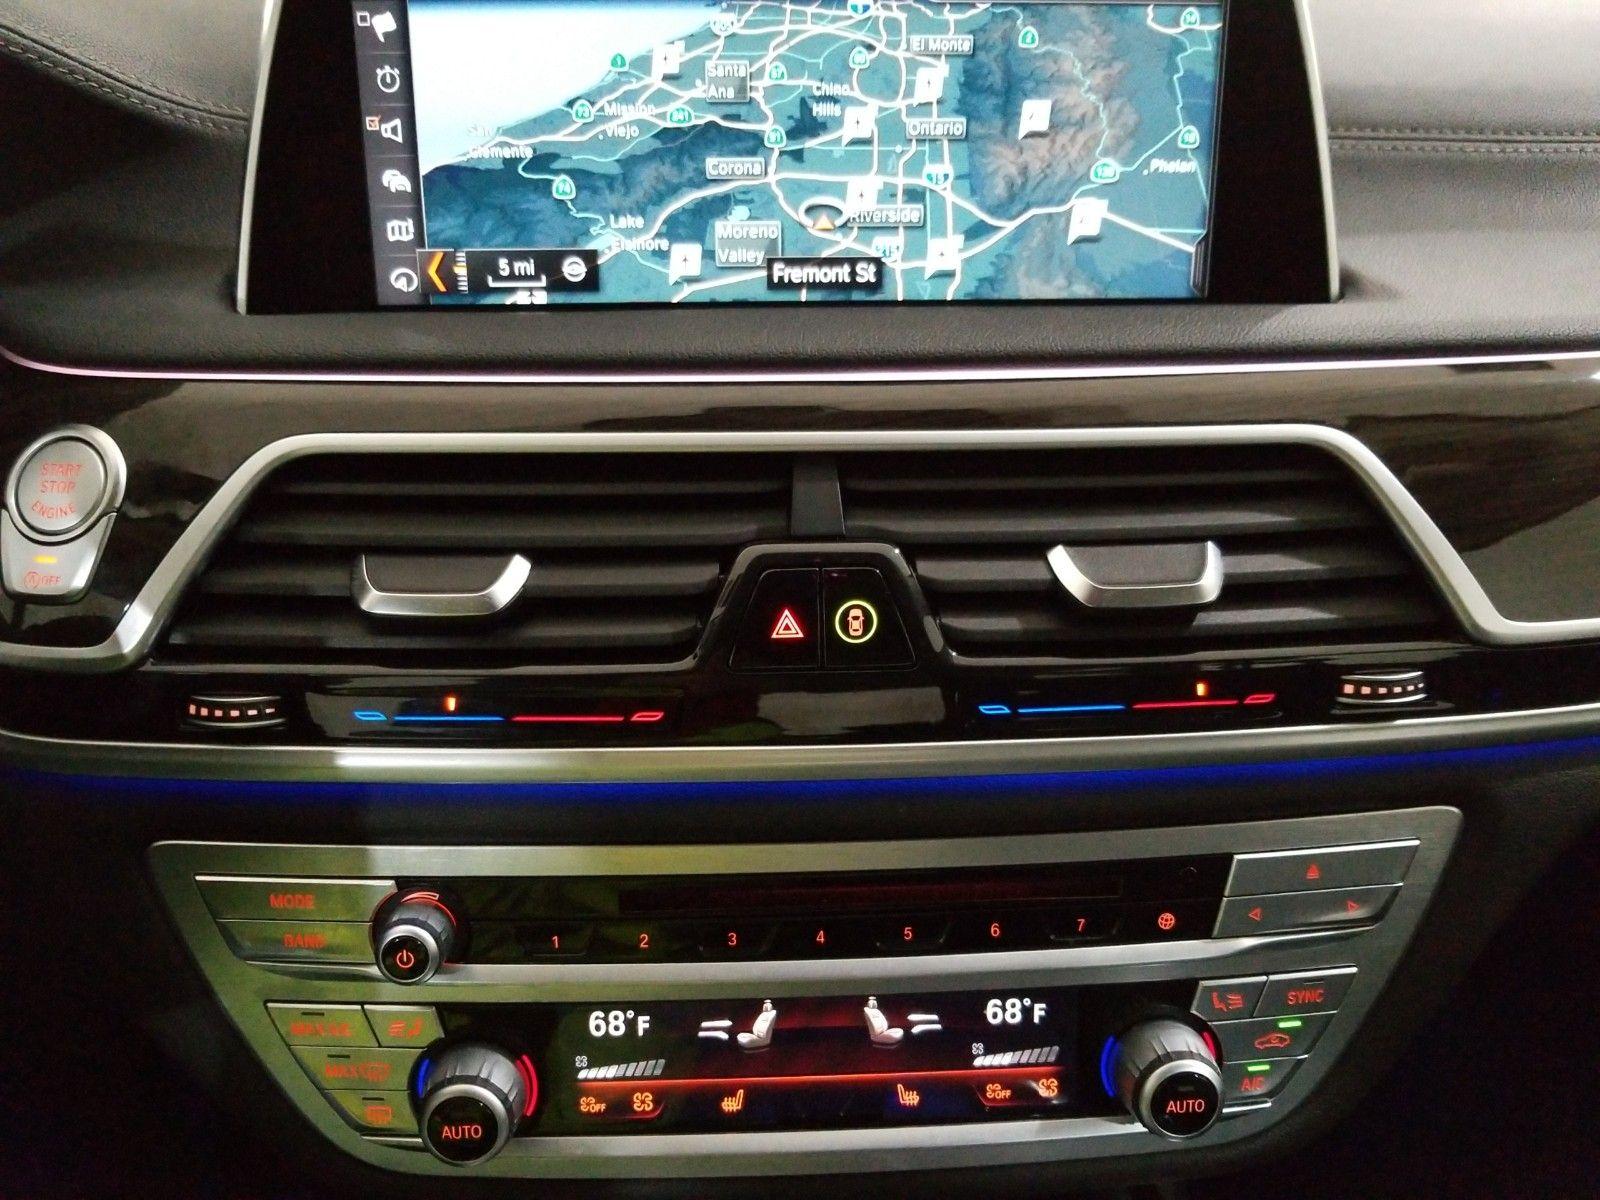 2019 BMW 7 SERIES - Used Car Auction - Car Export | AuctionXM